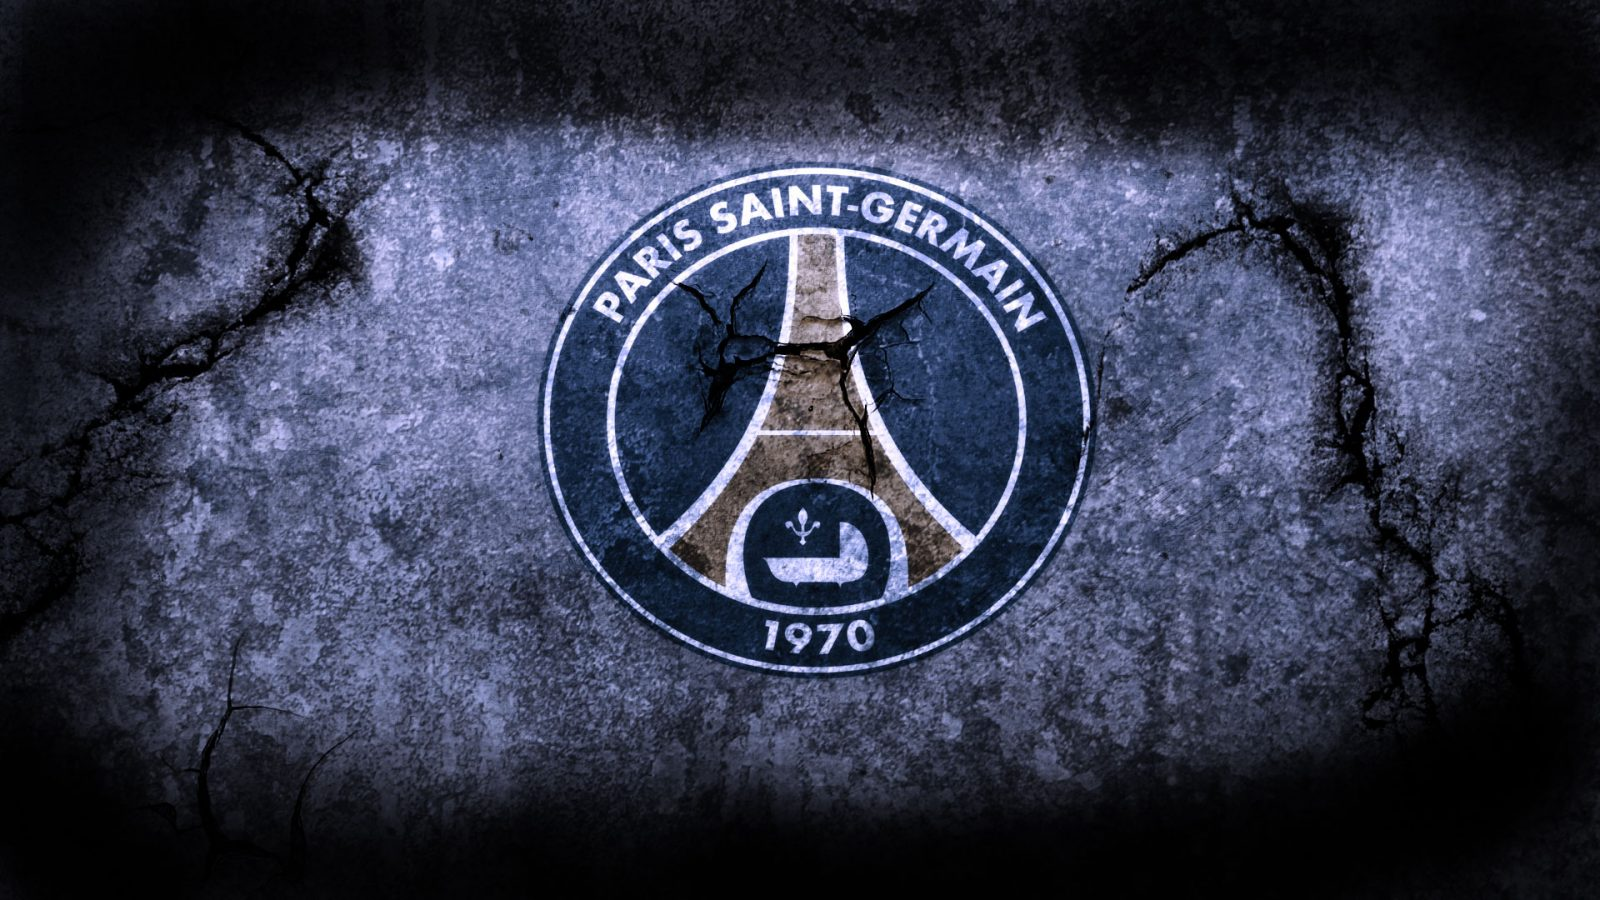 PSG Logo 2014 Wallpaper